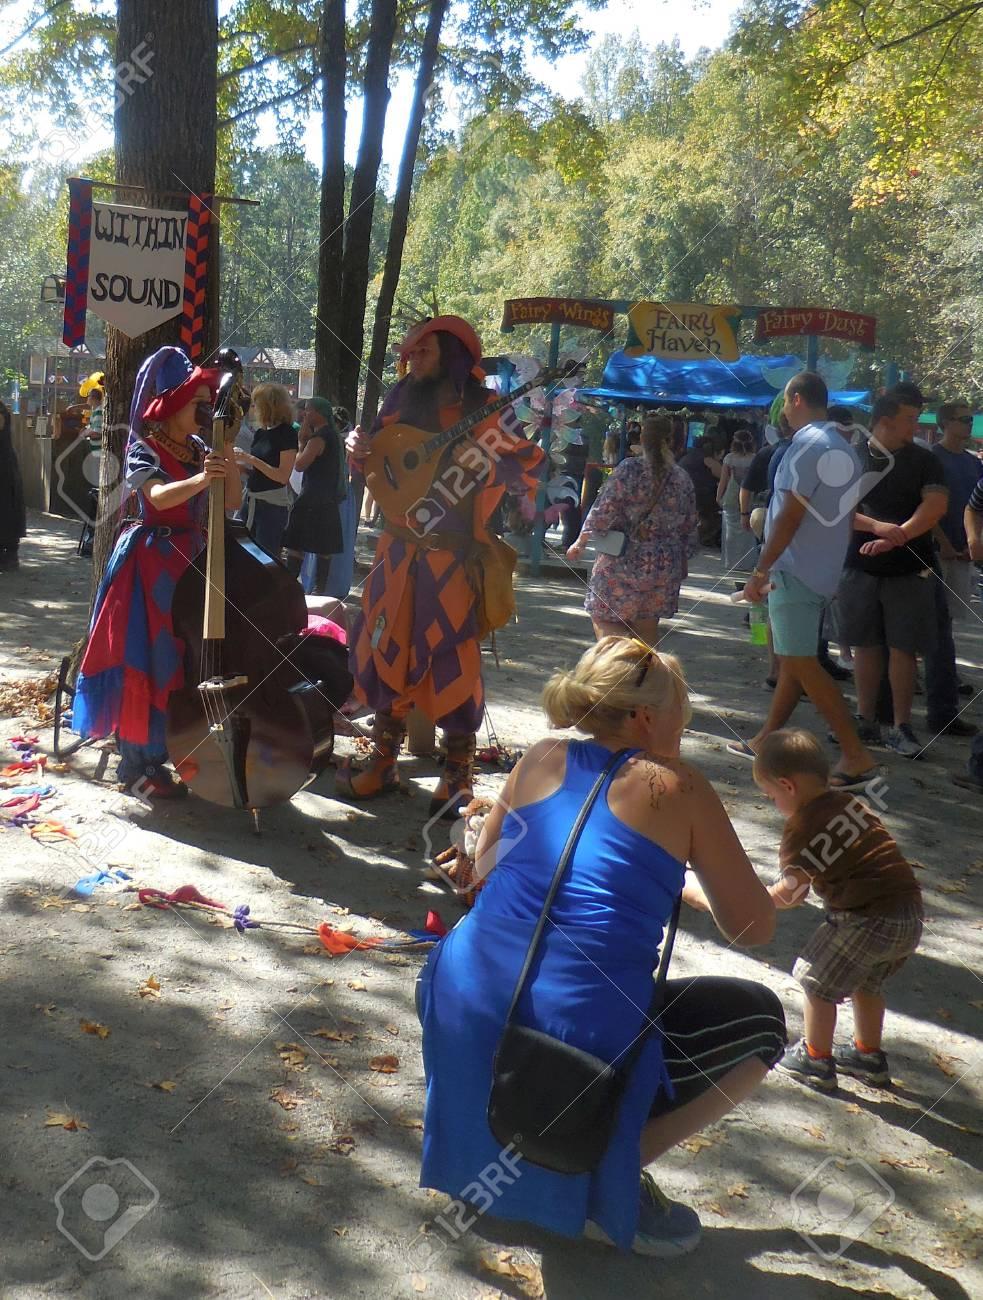 October 16, 2016 - Huntersville, NC - Renessaince Festival Stock Photo - 78727523